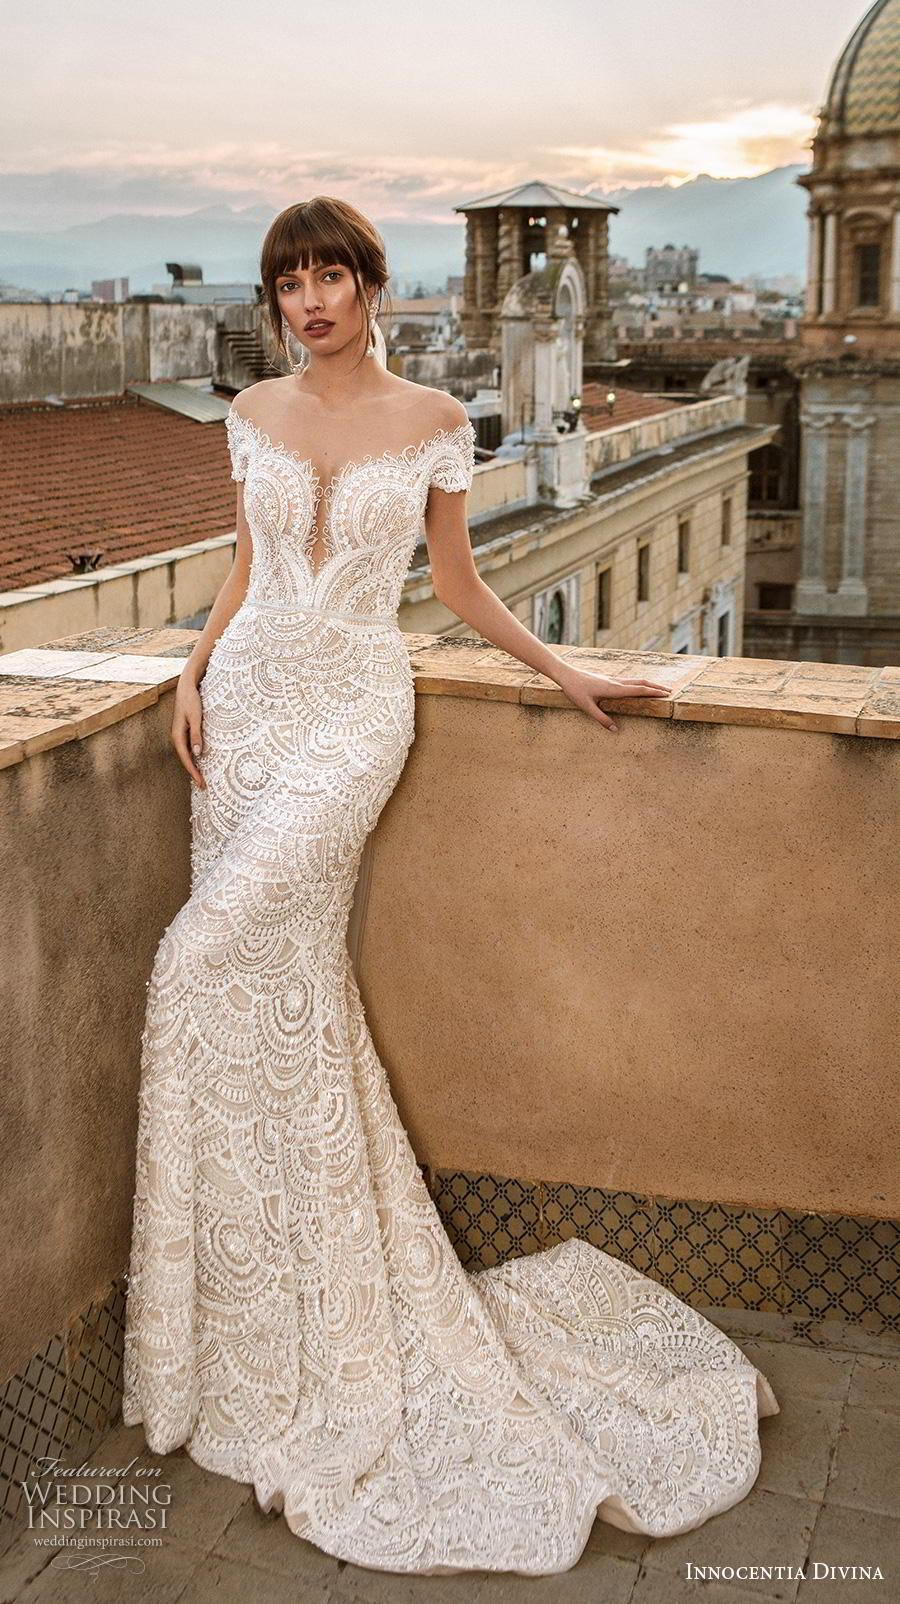 innocentia divina 2020 bridal short sleeves illusion bateau v neck full embellishment elegant fit and flare sheath wedding dress mid back medium train (9) mv